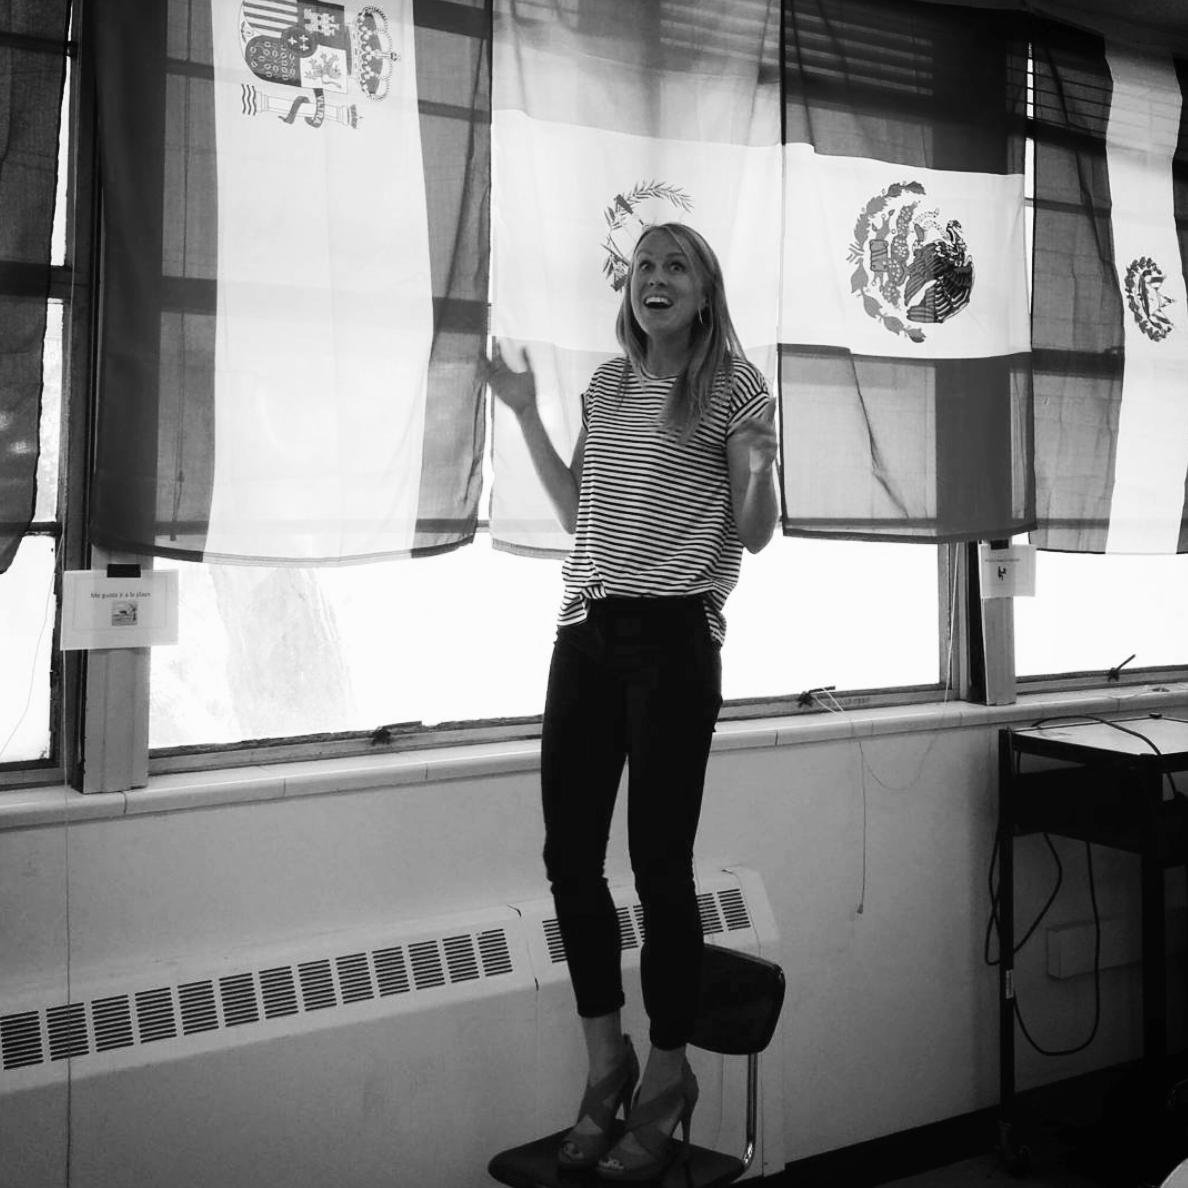 Britt Faris - Liz met Britt teaching at Locke.